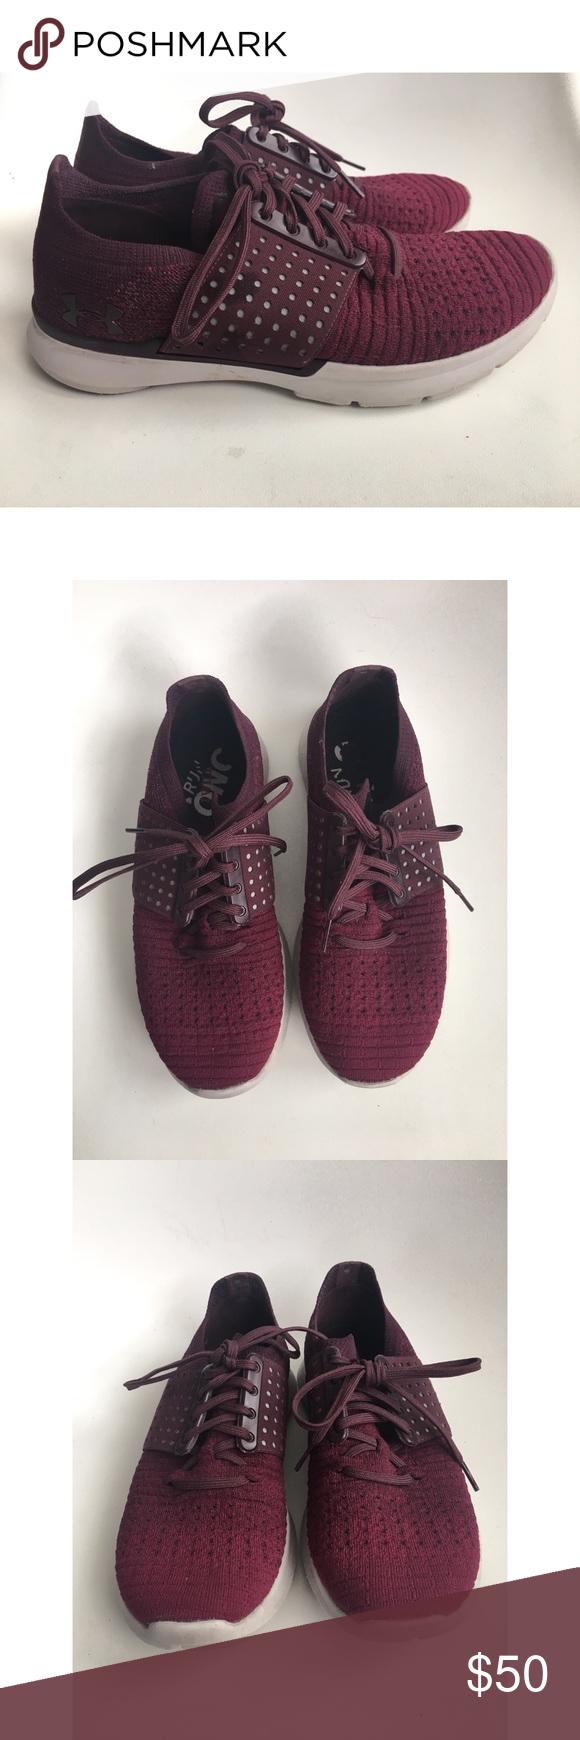 best cheap c3c5f 929e3 UA Women's Speedform Slingwrap Fade Running Shoe These shoes ...